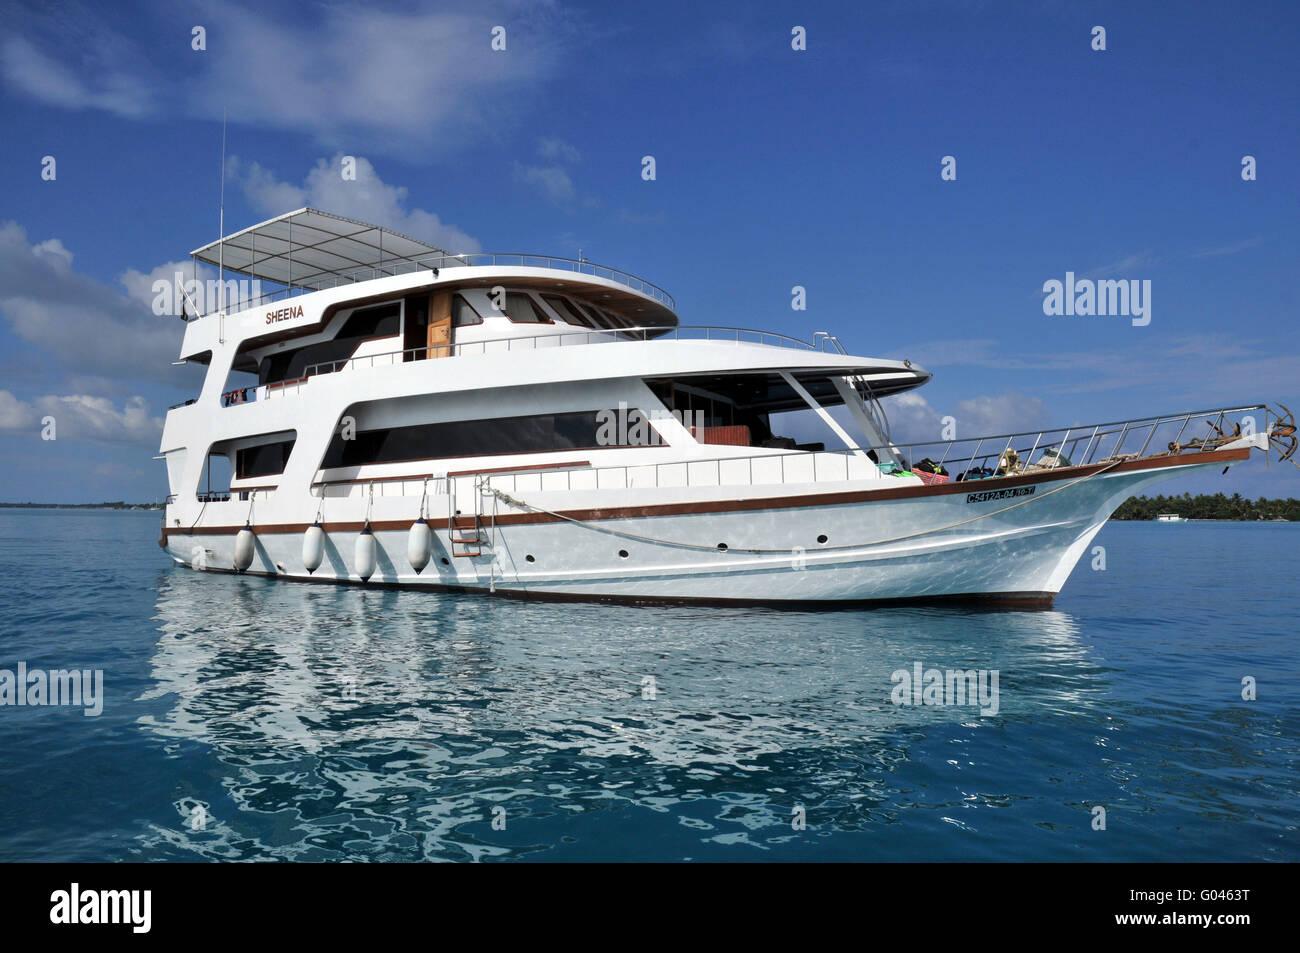 Diving boat, M/Y Sheena, Maledives - Stock Image